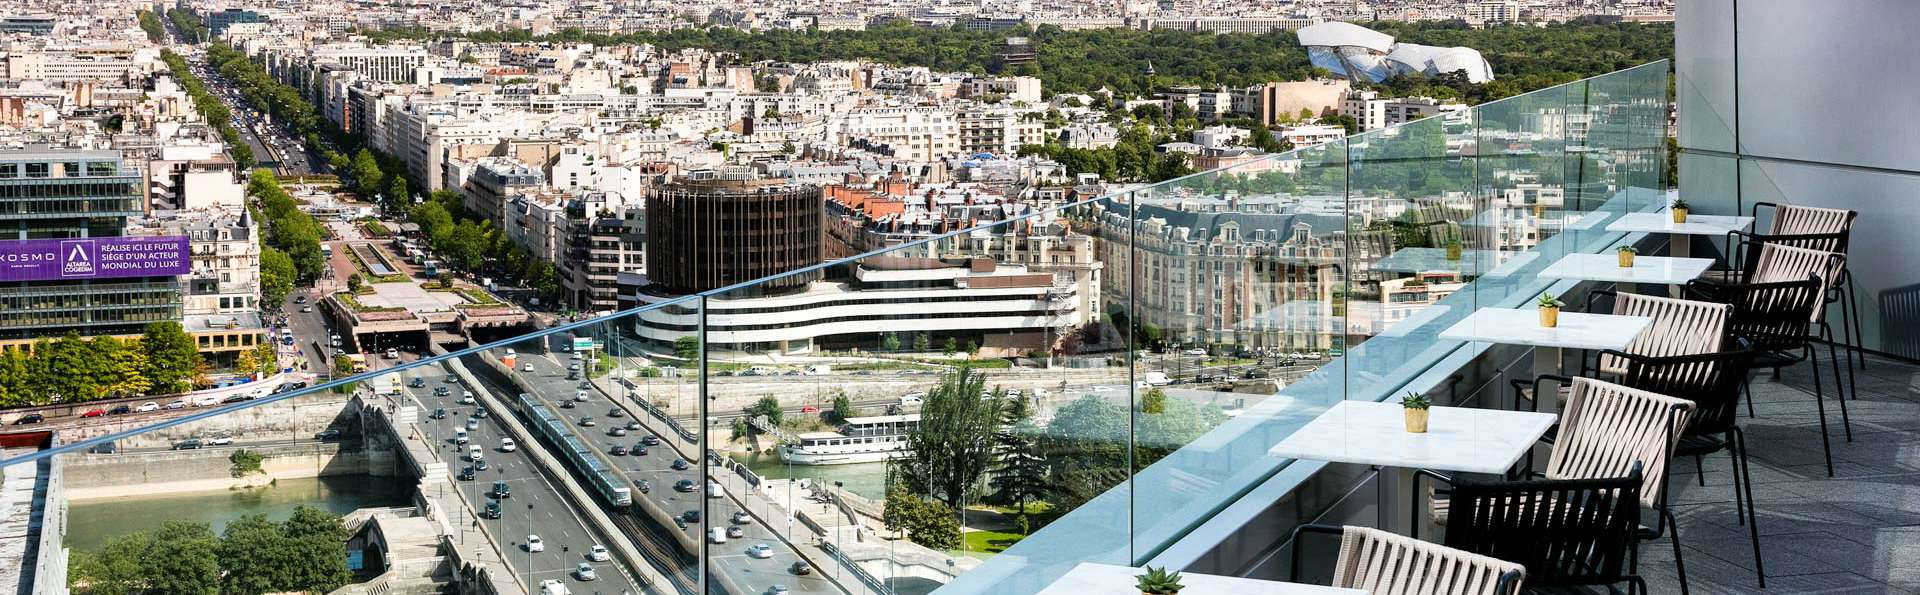 Melia Paris La Défense - EDIT_TERRACE3.jpg